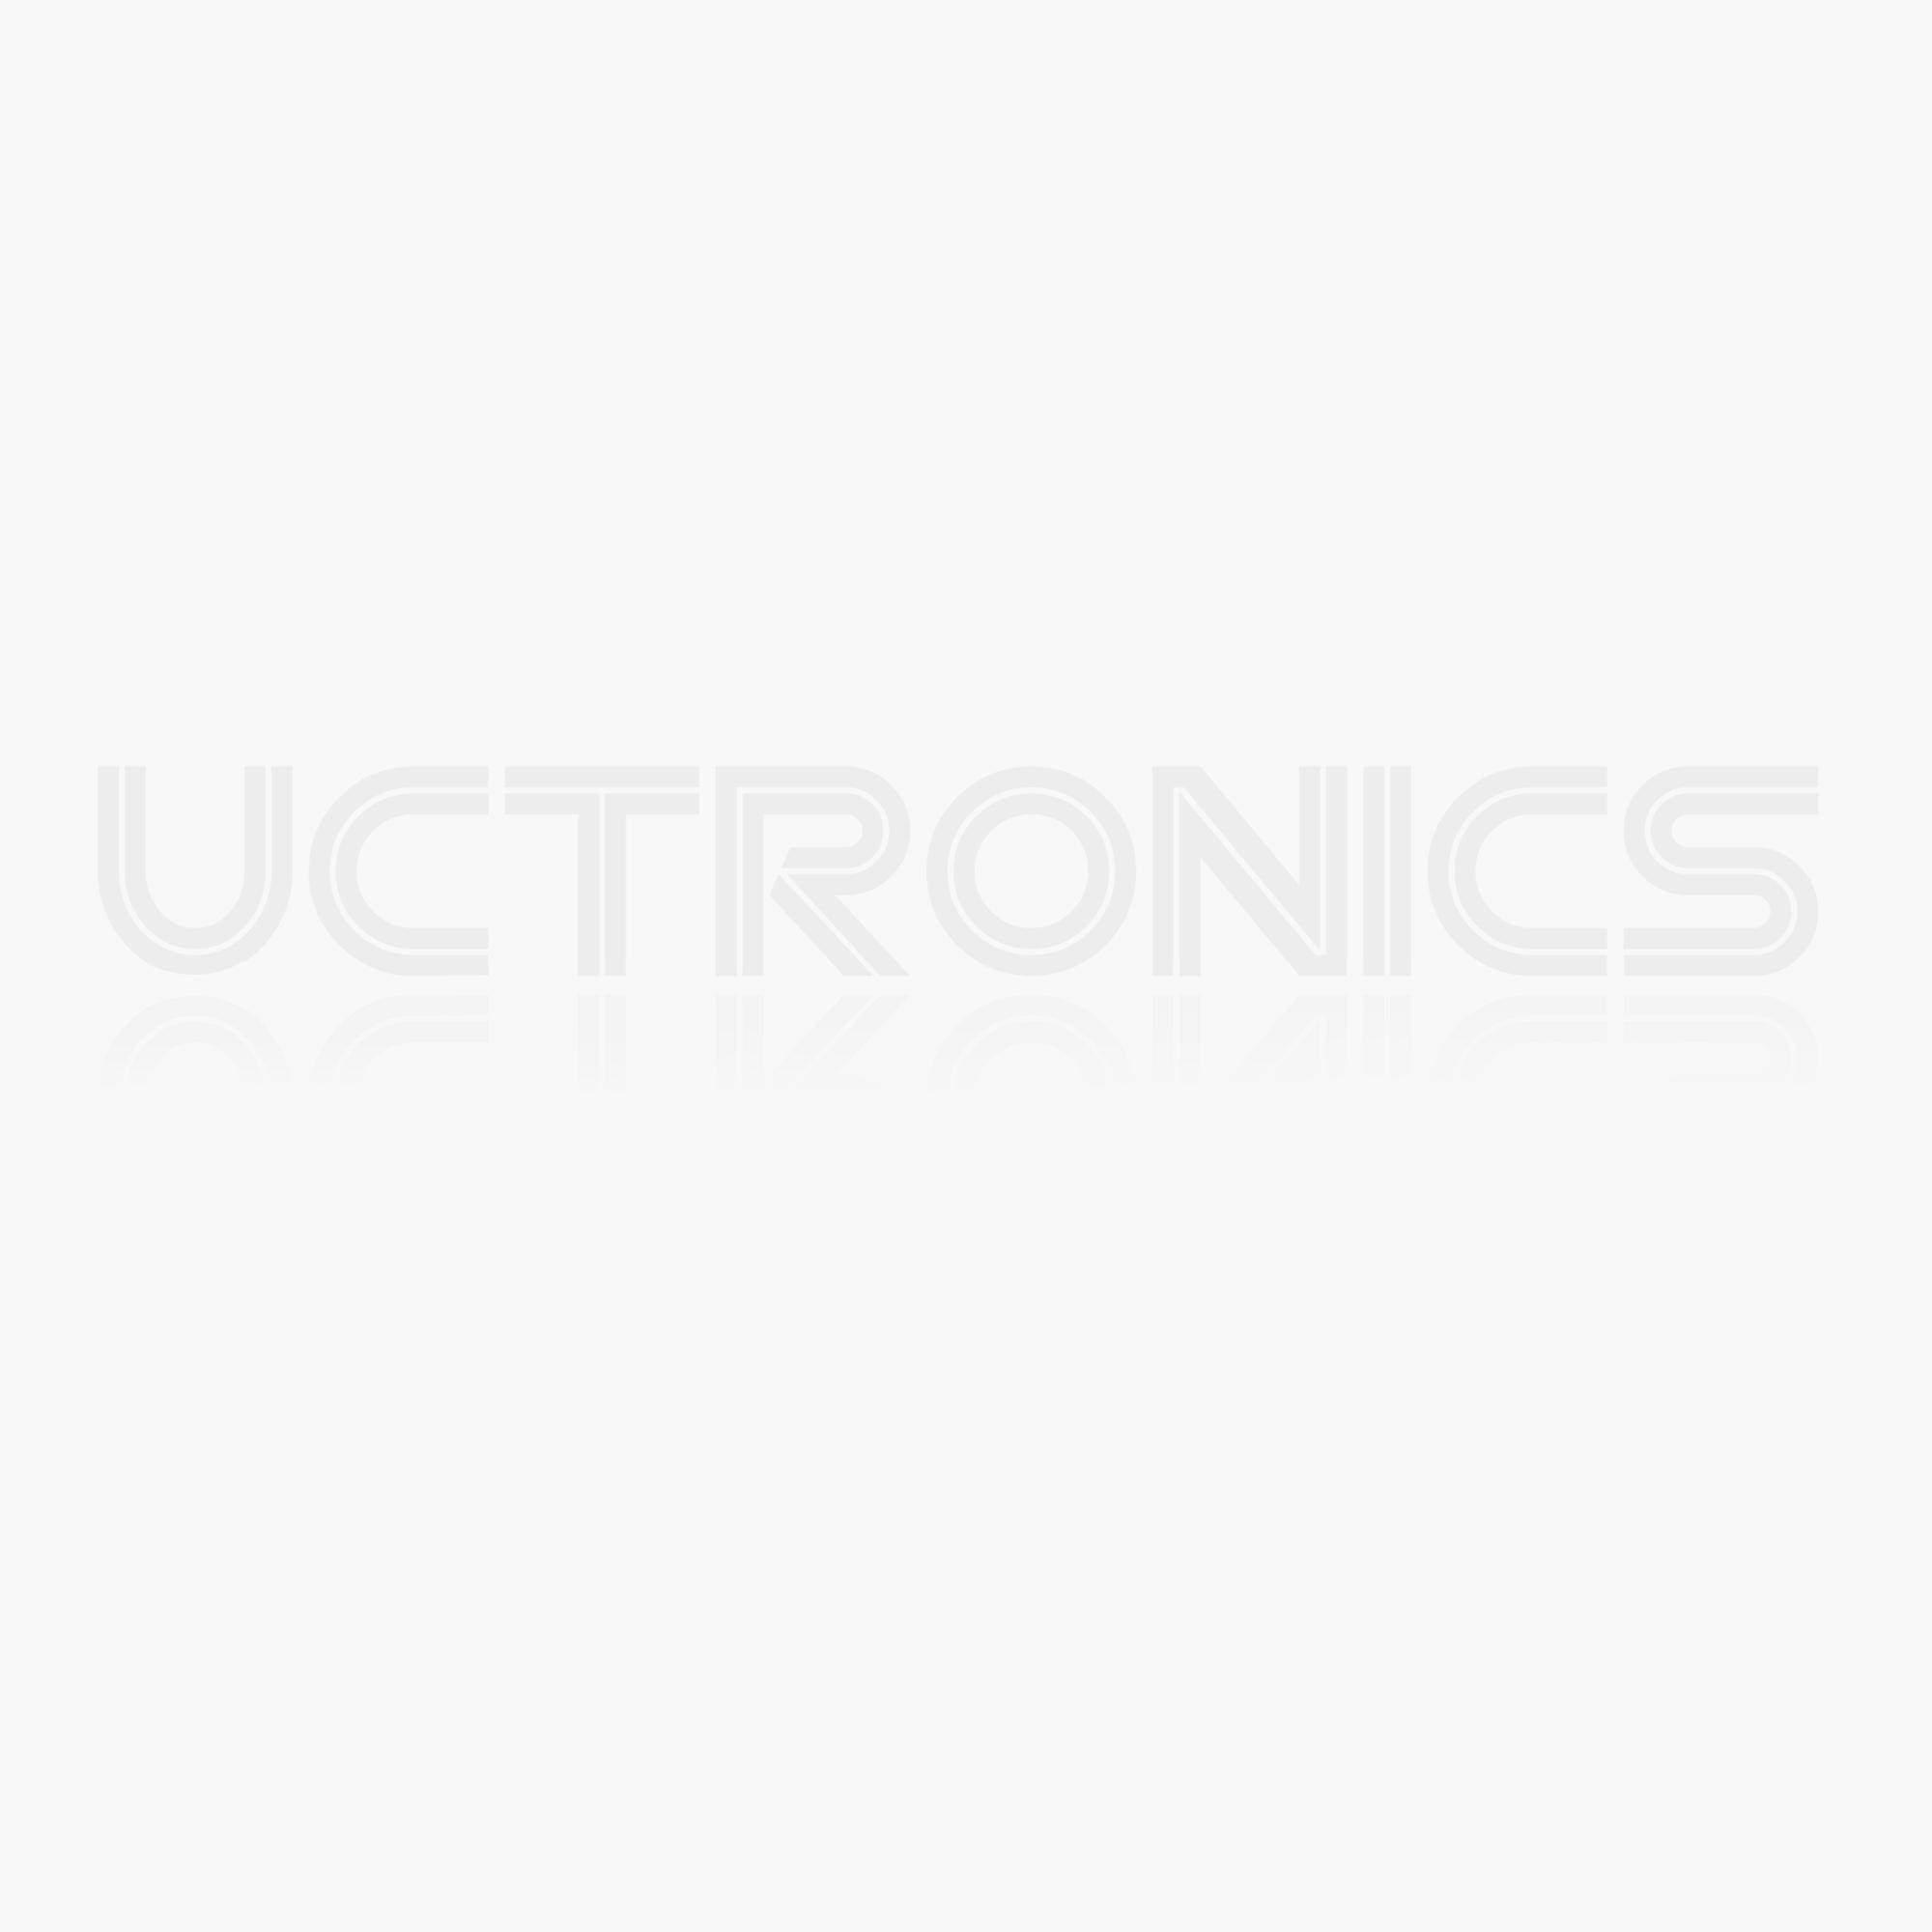 Crash Collision Sensor Detection Module /w Switch for Arduino Smart Robot